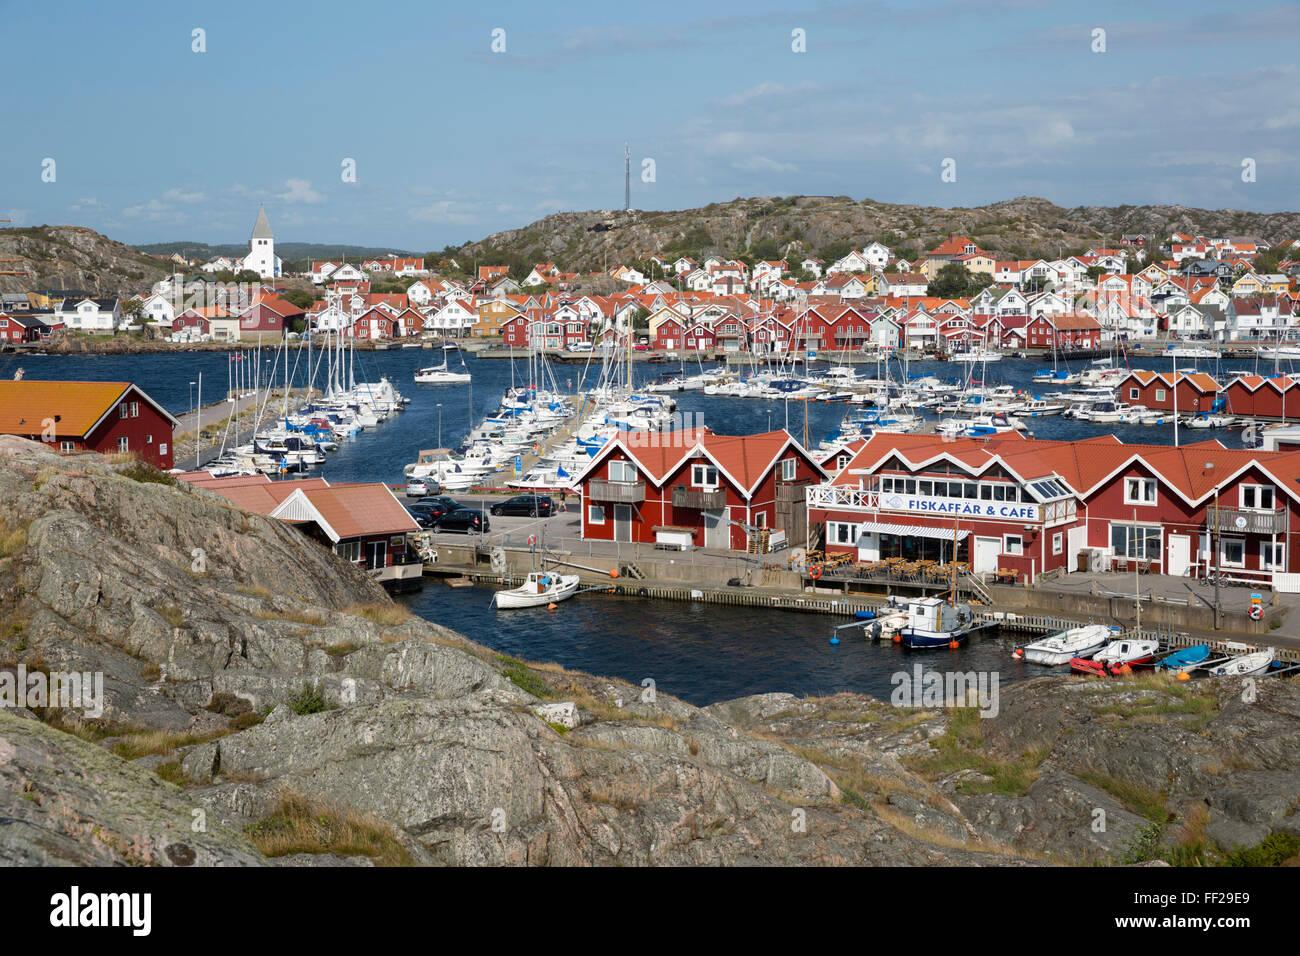 View over town and harbour, Skarhamn, Tjorn, BohusRMan Coast, southwest Sweden, Sweden, Scandinavia, Europe - Stock Image